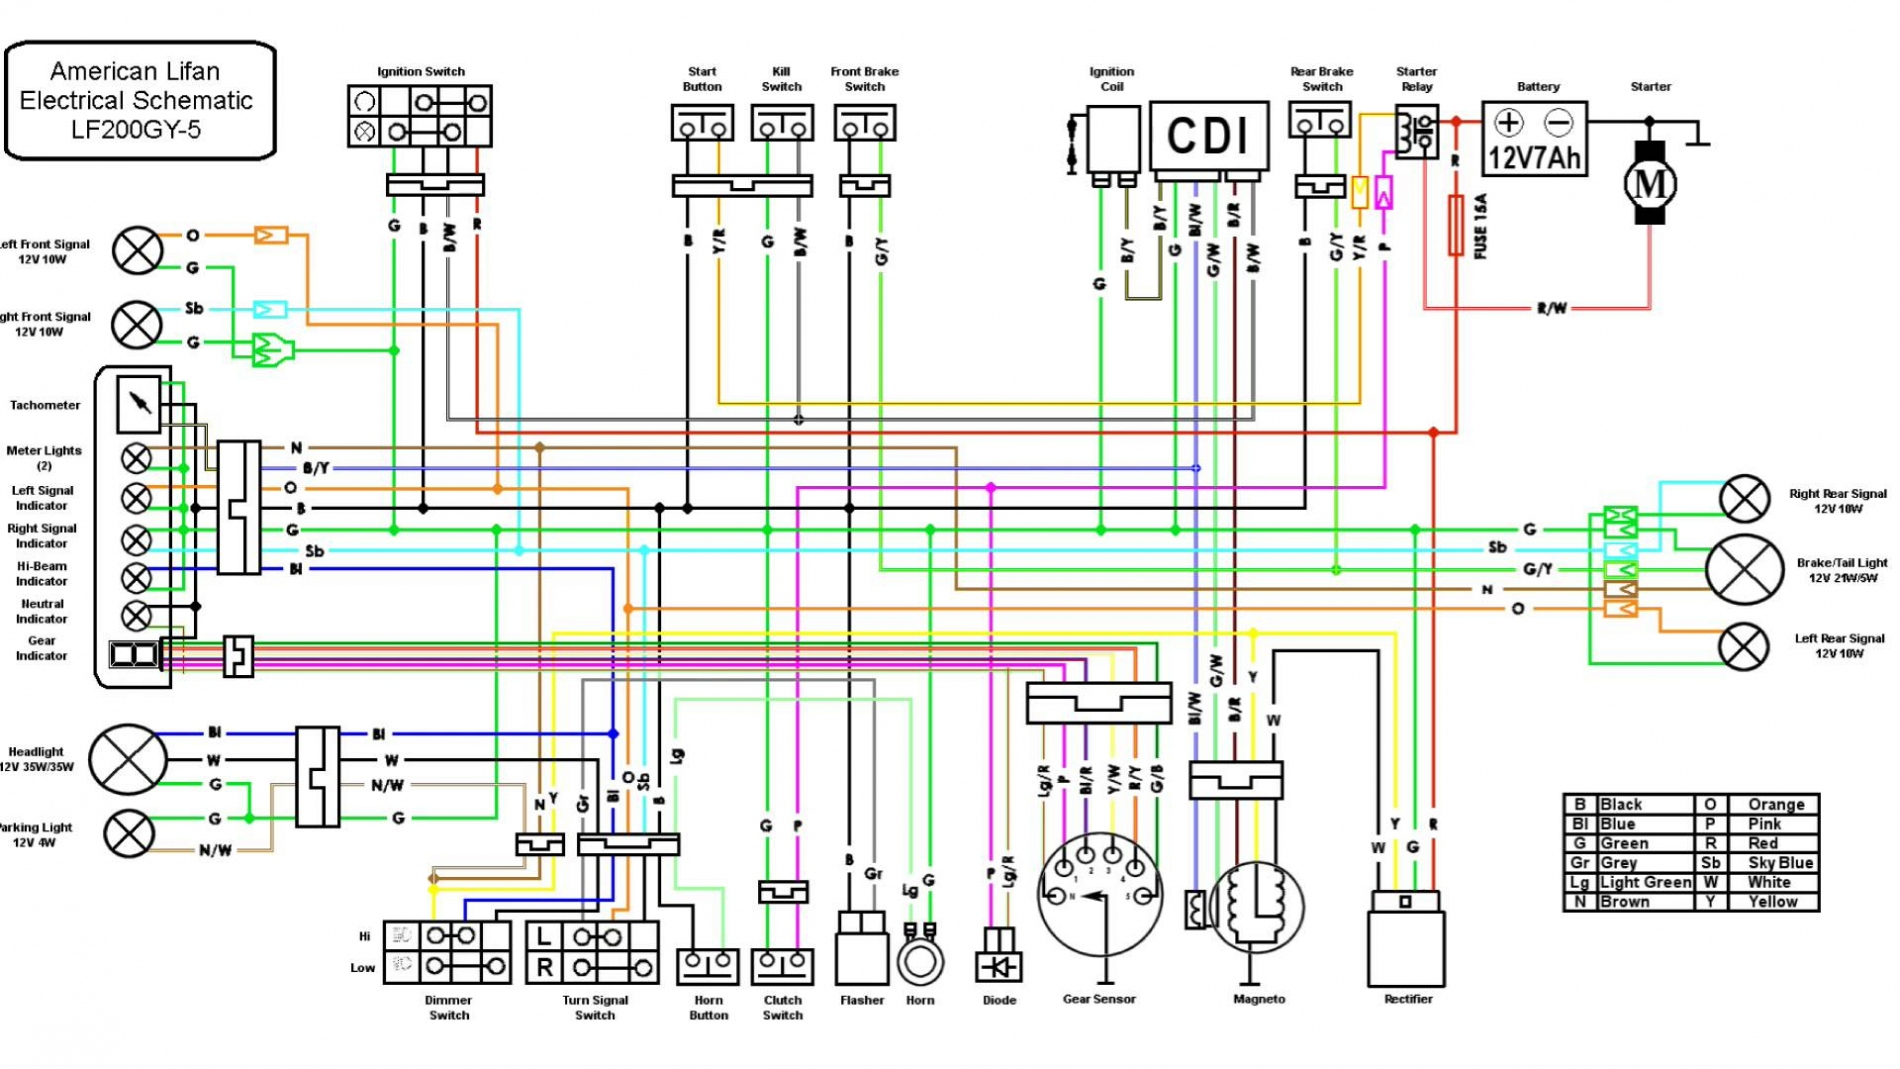 125Cc Atv Wiring | Wiring Diagram - Taotao 125 Atv Wiring Diagram